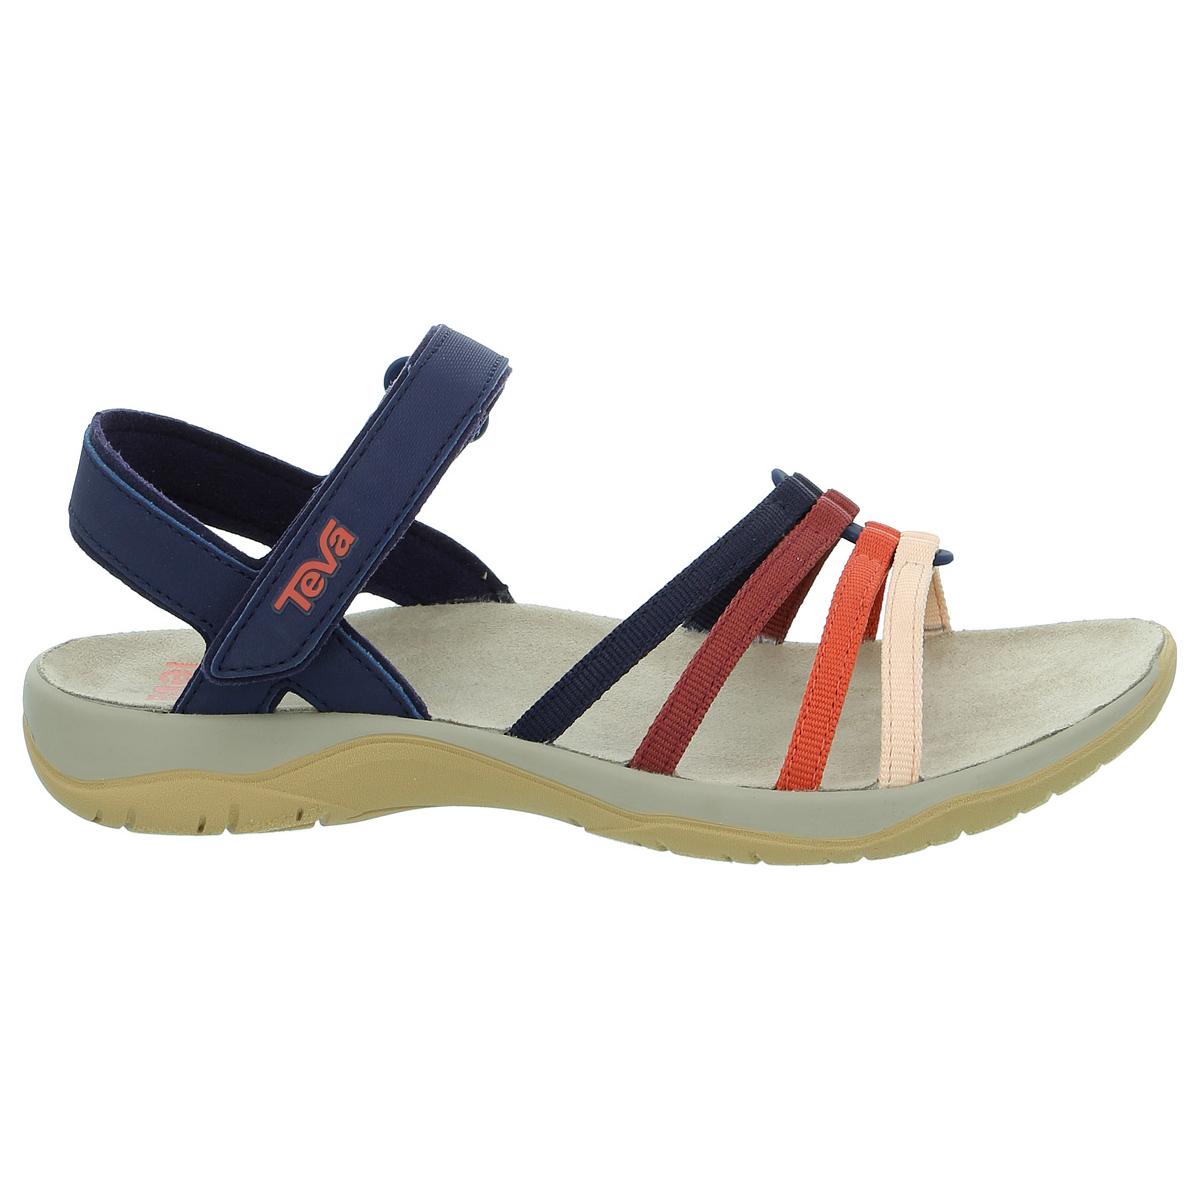 Eclipse//Multi Teva Elzada Web Supportive Walking Sandals